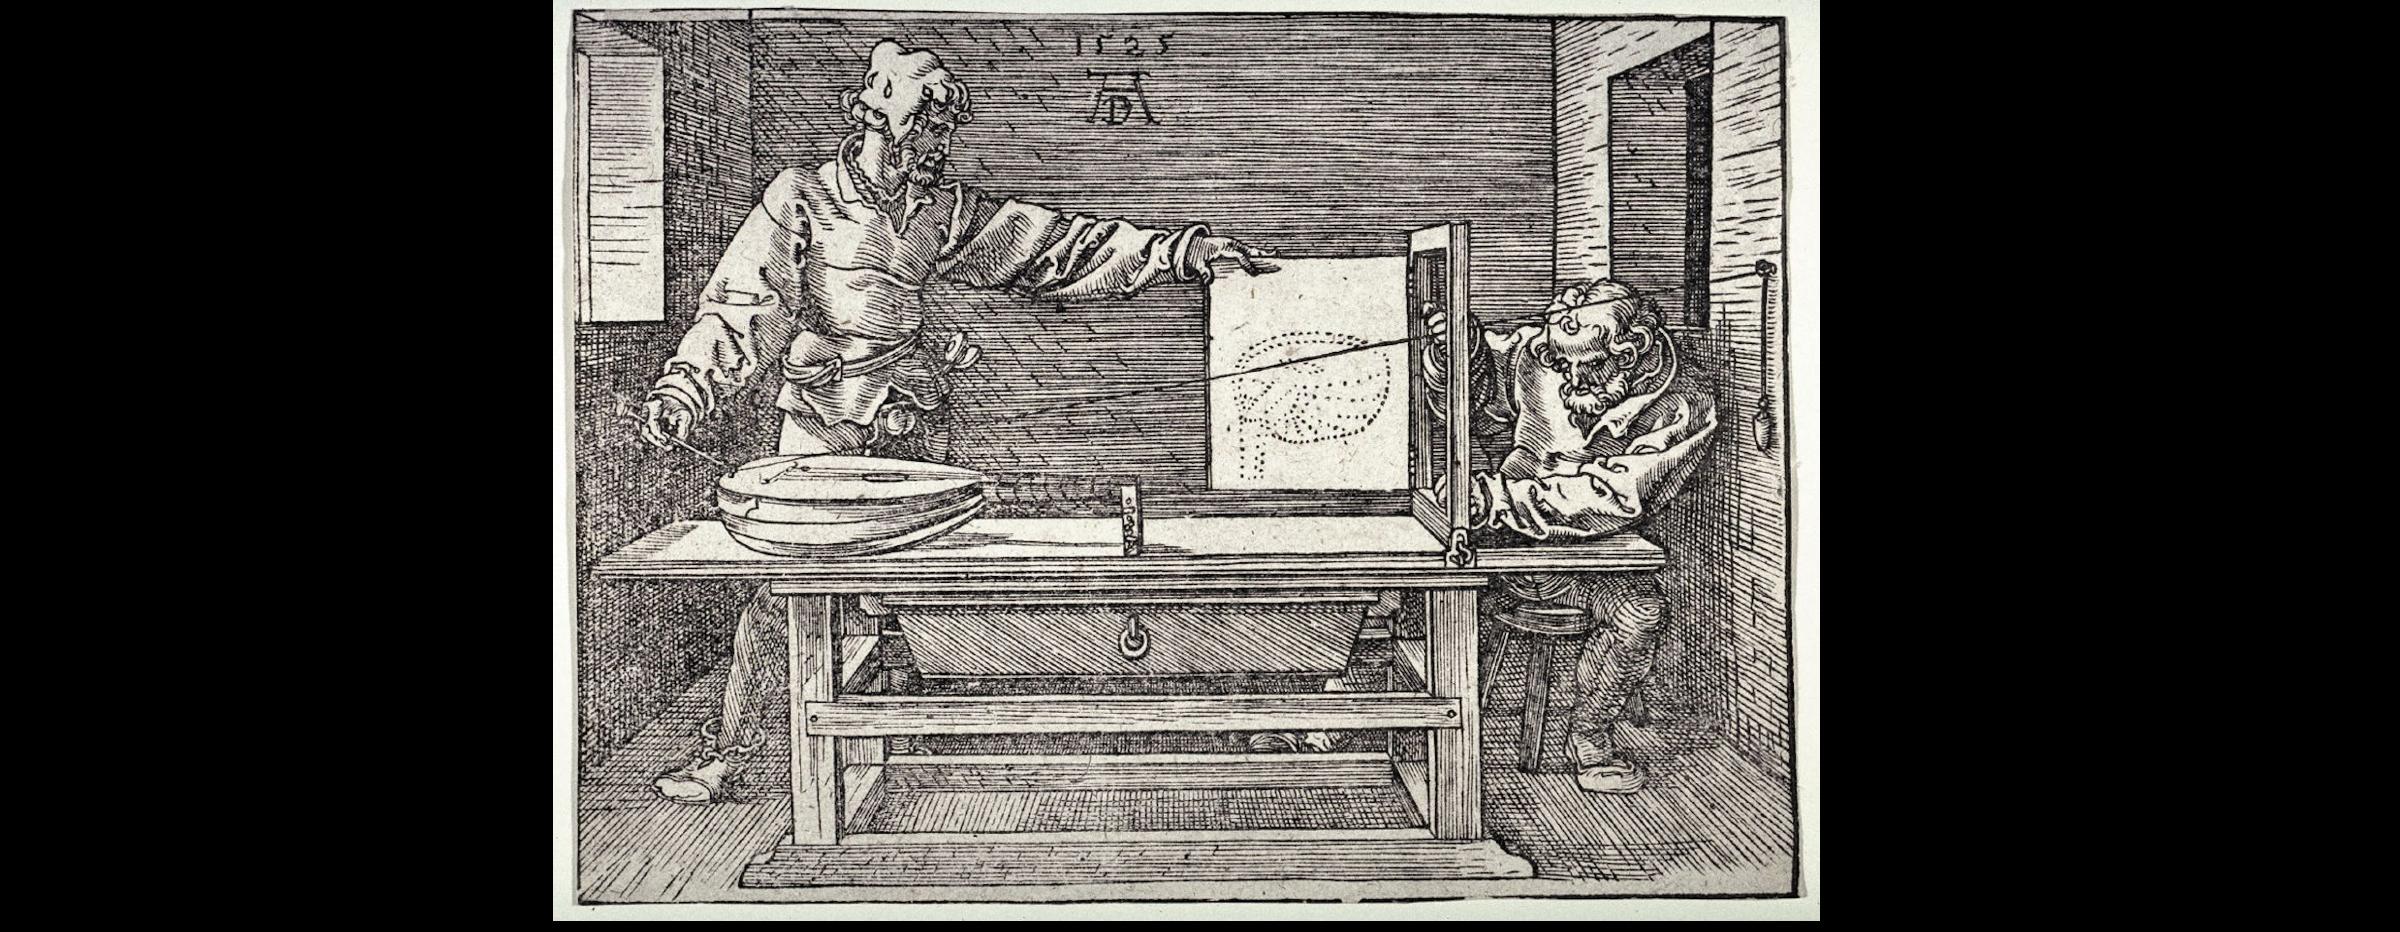 BBM 413: Fundamentals of Image Processing